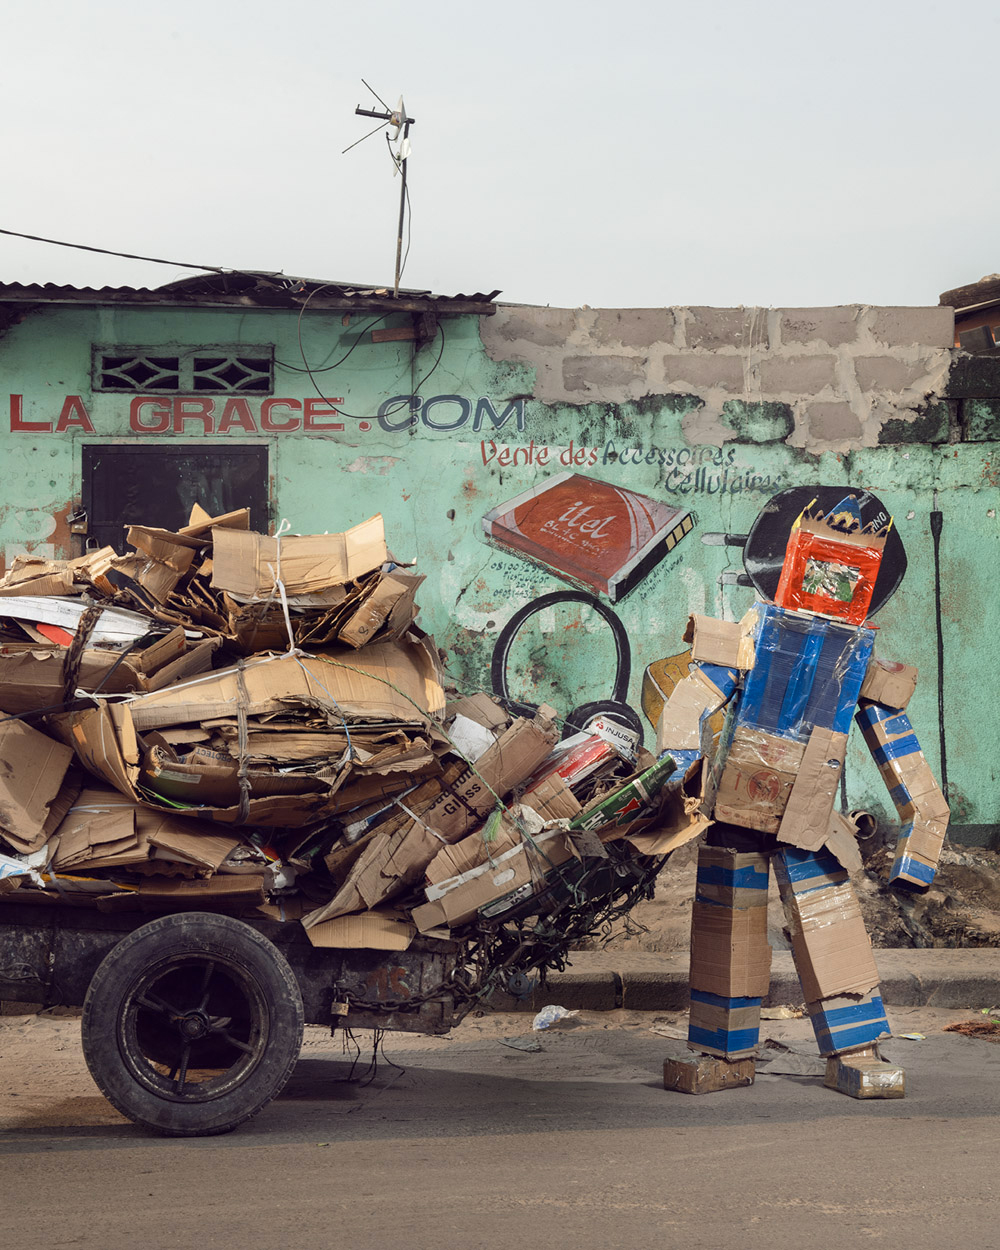 Untitled #20, 2020 Homo Detritus, Real Portraitik #5 Kinshasa, RDC ©Stephan Gladieu